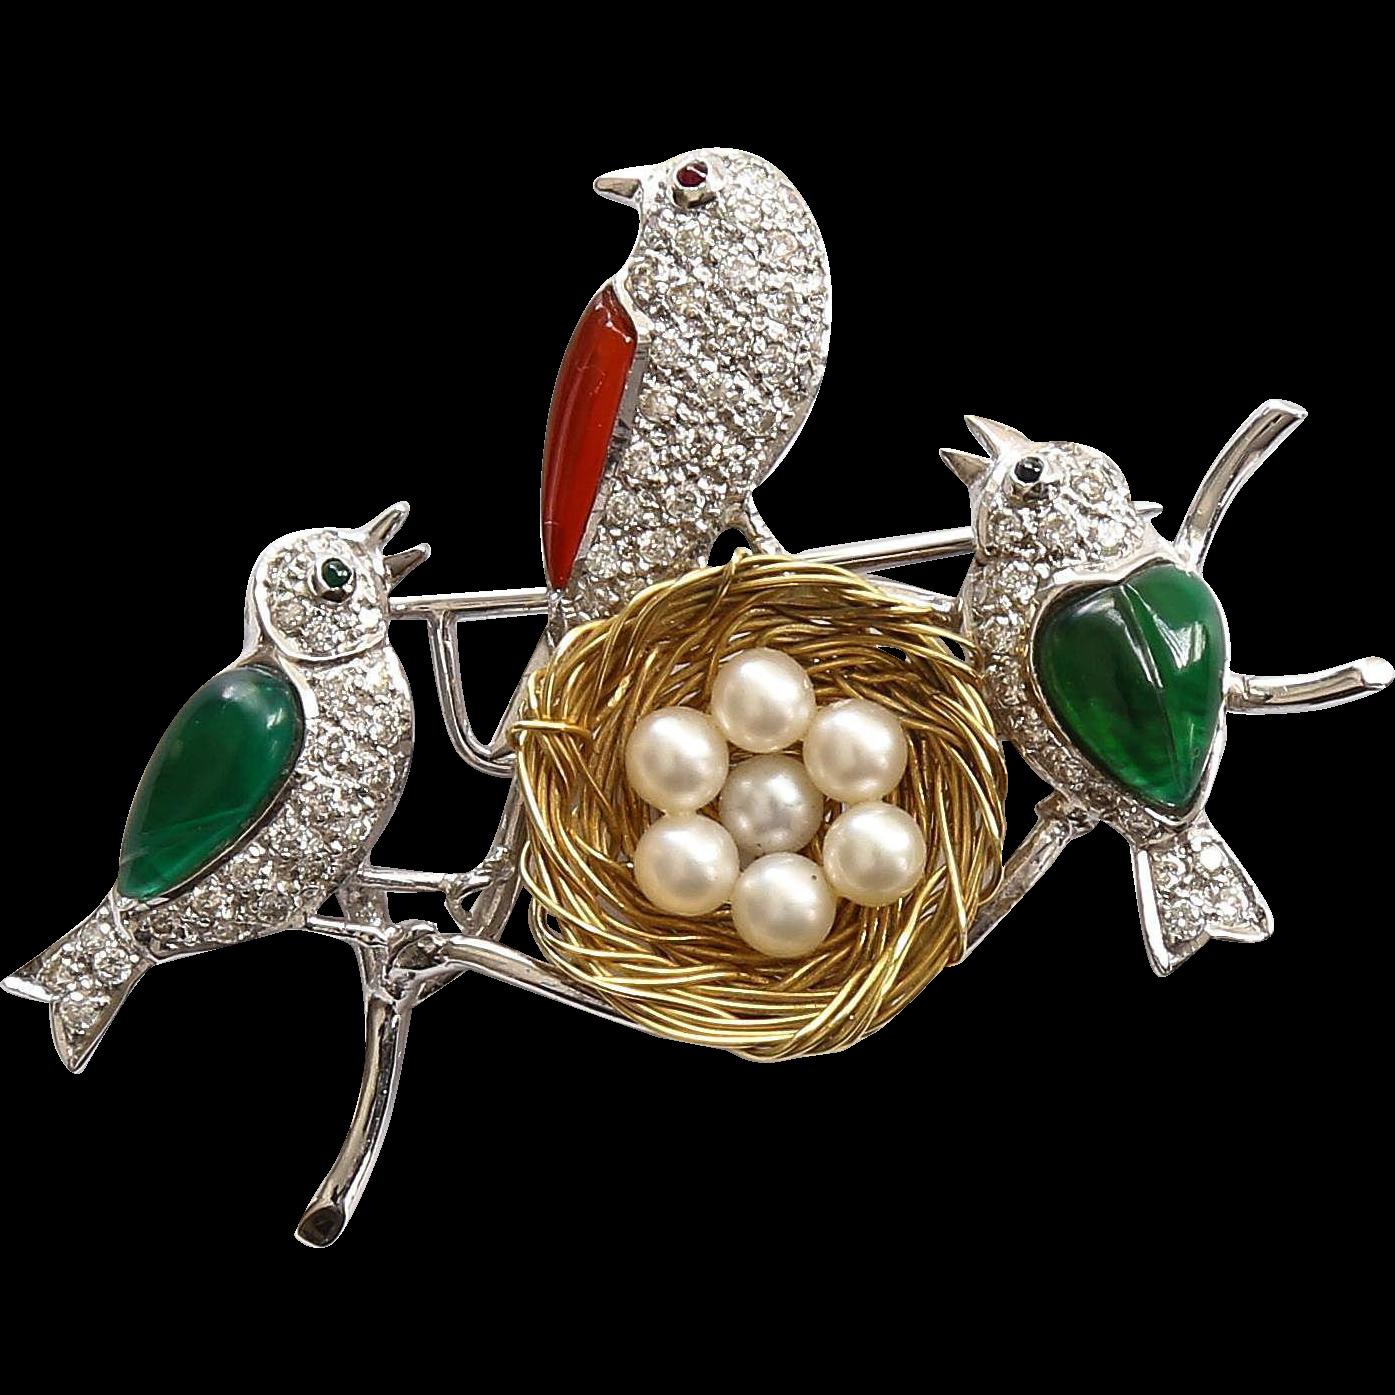 vintage lady 39 s 18k diamond pearl birds with nest brooch fine jewelry bijoux montre. Black Bedroom Furniture Sets. Home Design Ideas